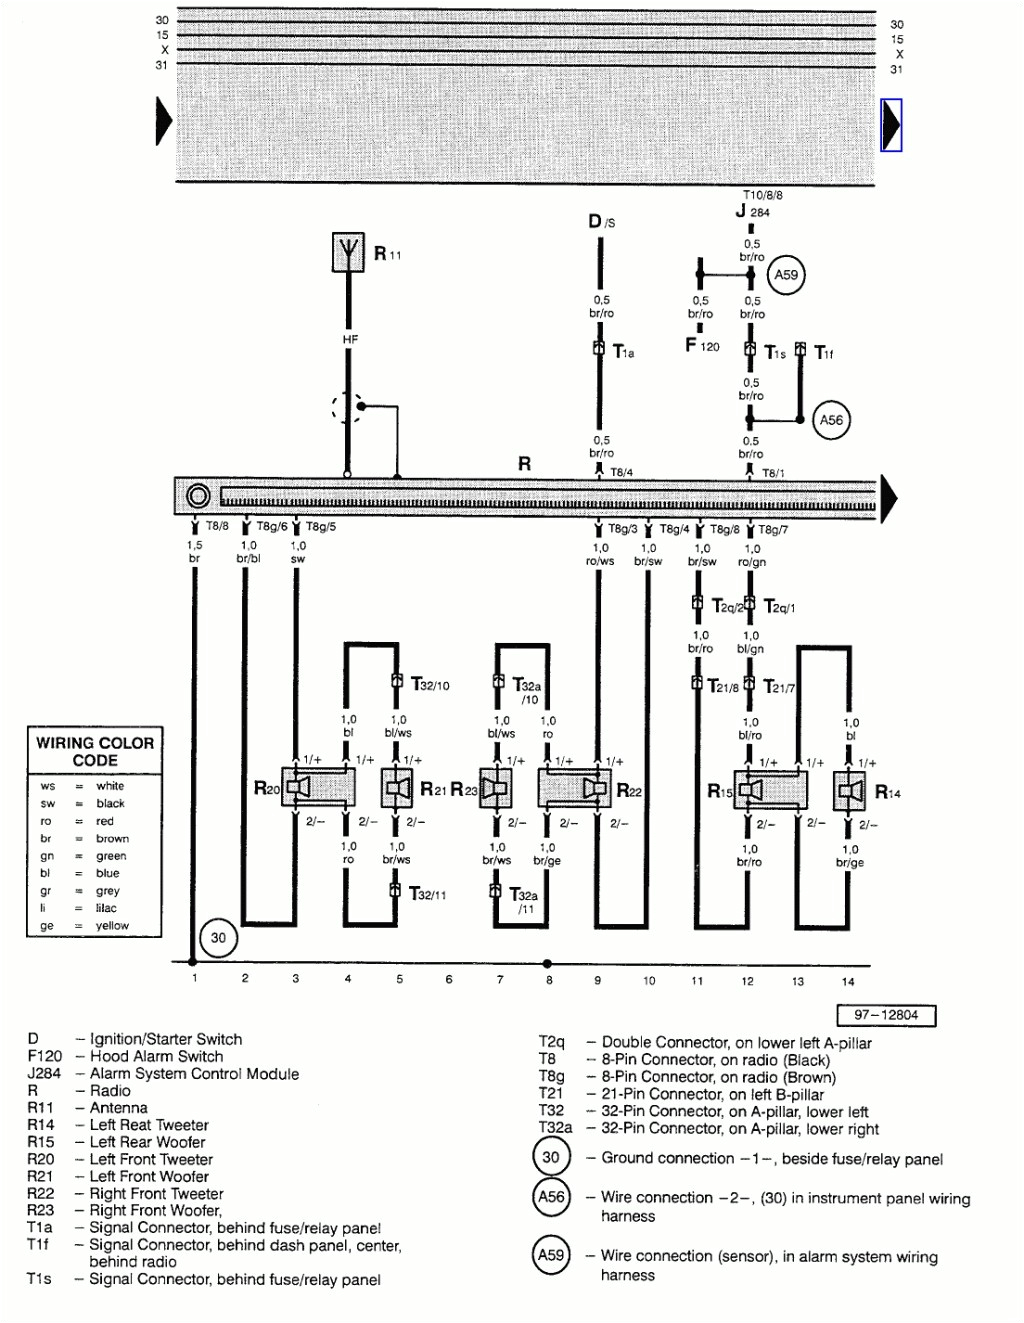 98 jetta wiring diagram wiring diagram show 98 jetta radio wiring diagram